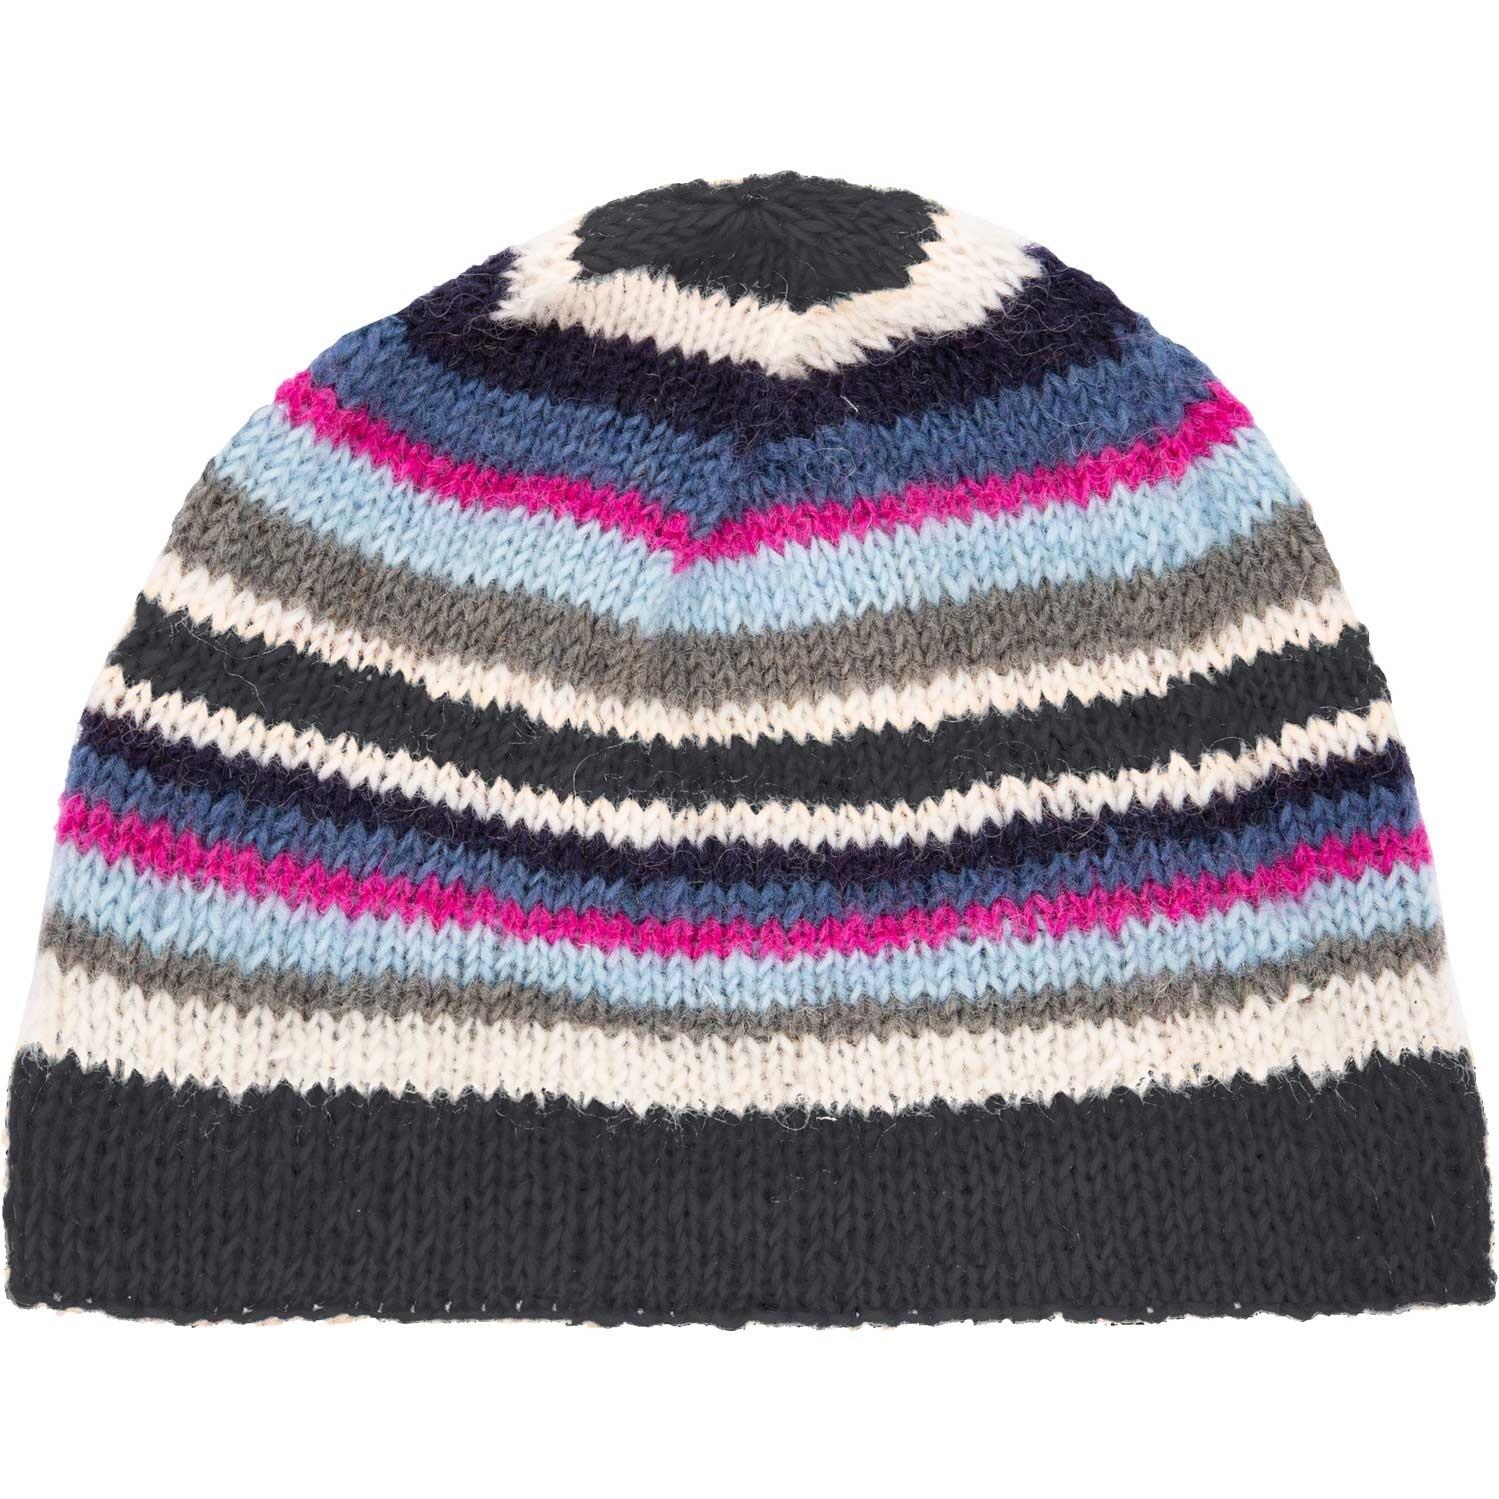 Sherpa Pangdey Hat - Rathee Blue